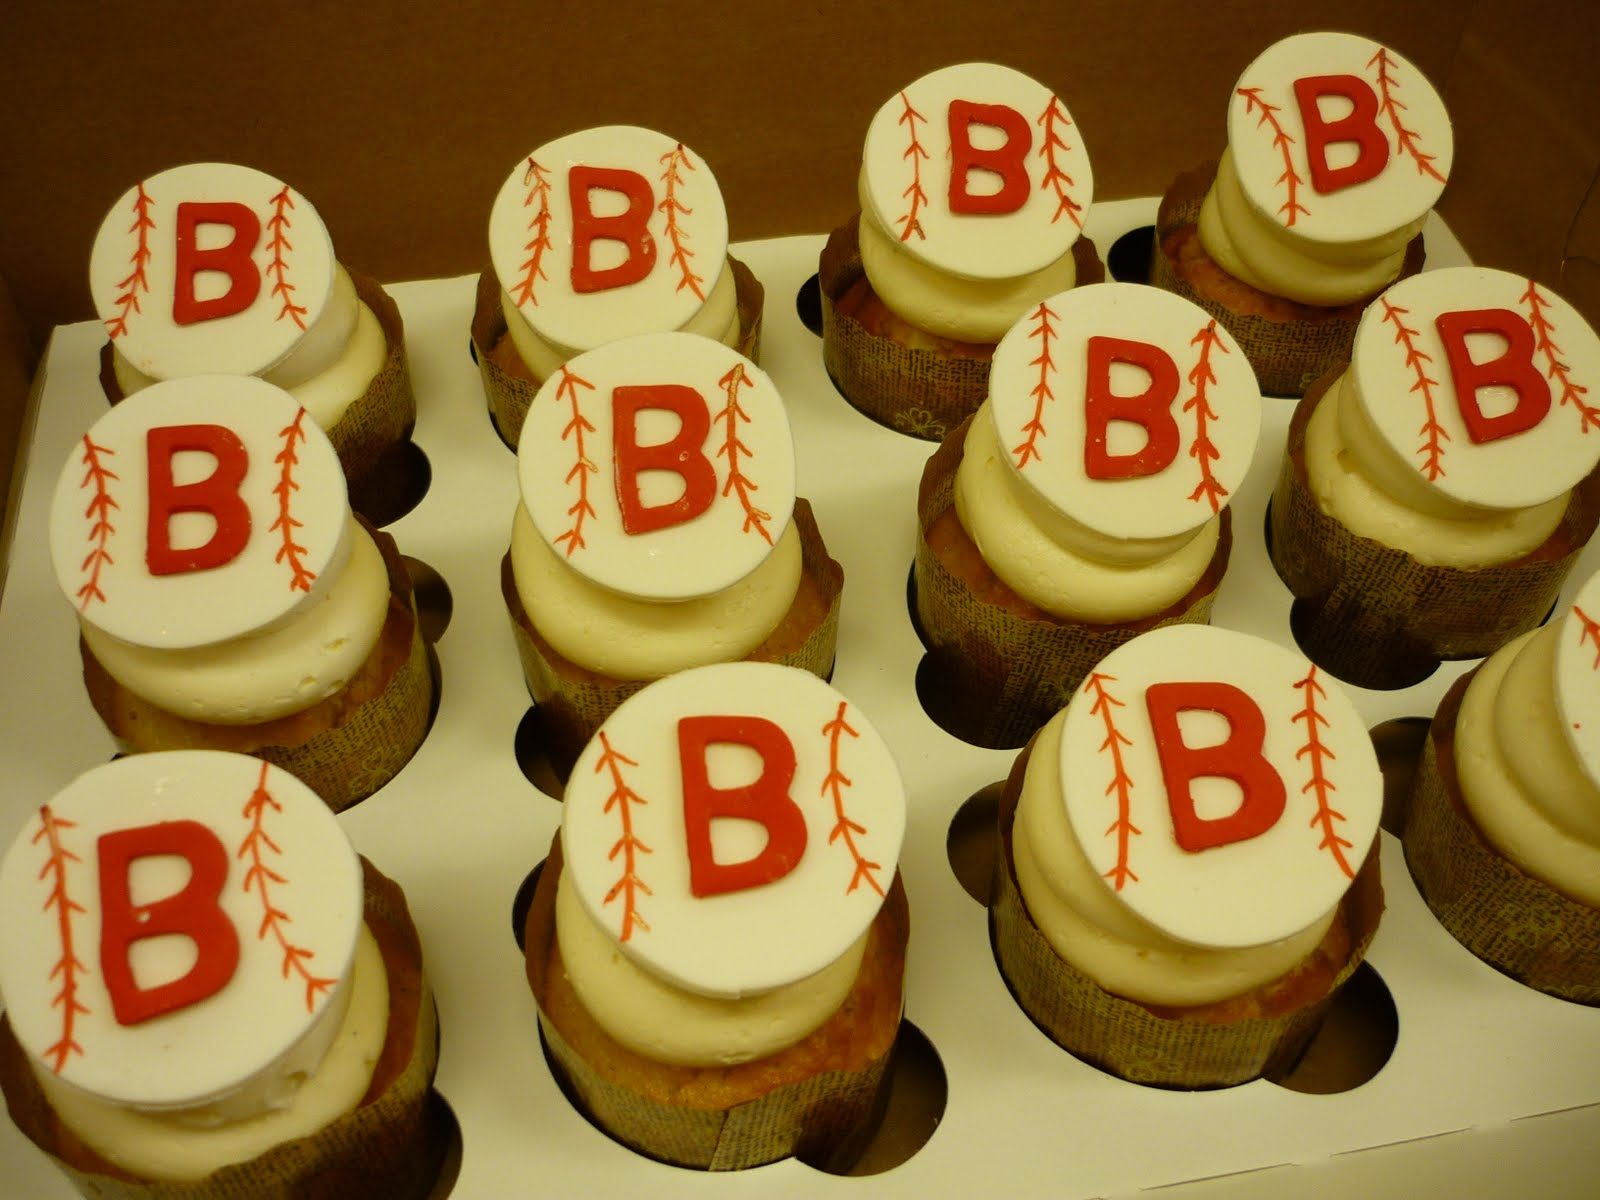 http://1.bp.blogspot.com/-qkeEvC0dtpw/TbWmYF2cKGI/AAAAAAAABLA/kRfb8ydP9Xs/s1600/Boston%25252BRed%25252BSox%25252BBaseball%25252BCupcakes.JPG